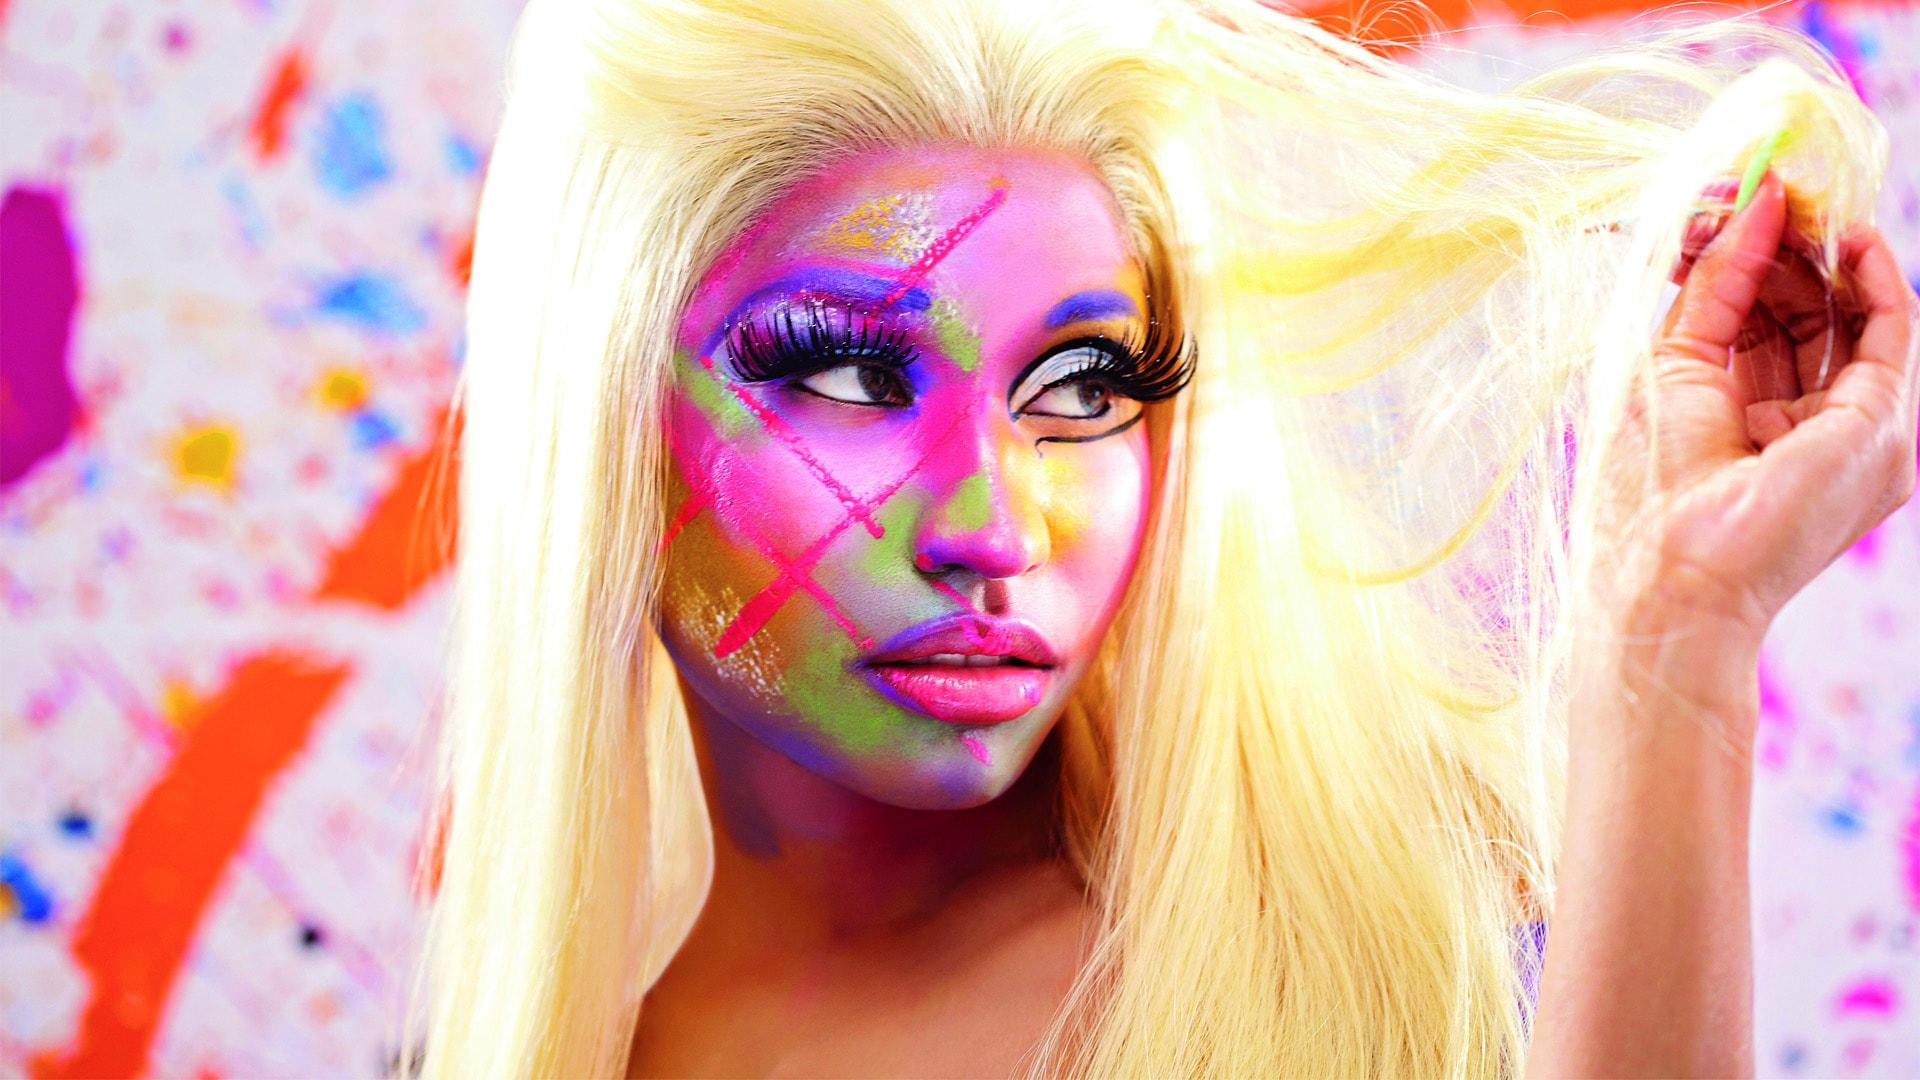 Nicki Minaj Full hd wallpapers